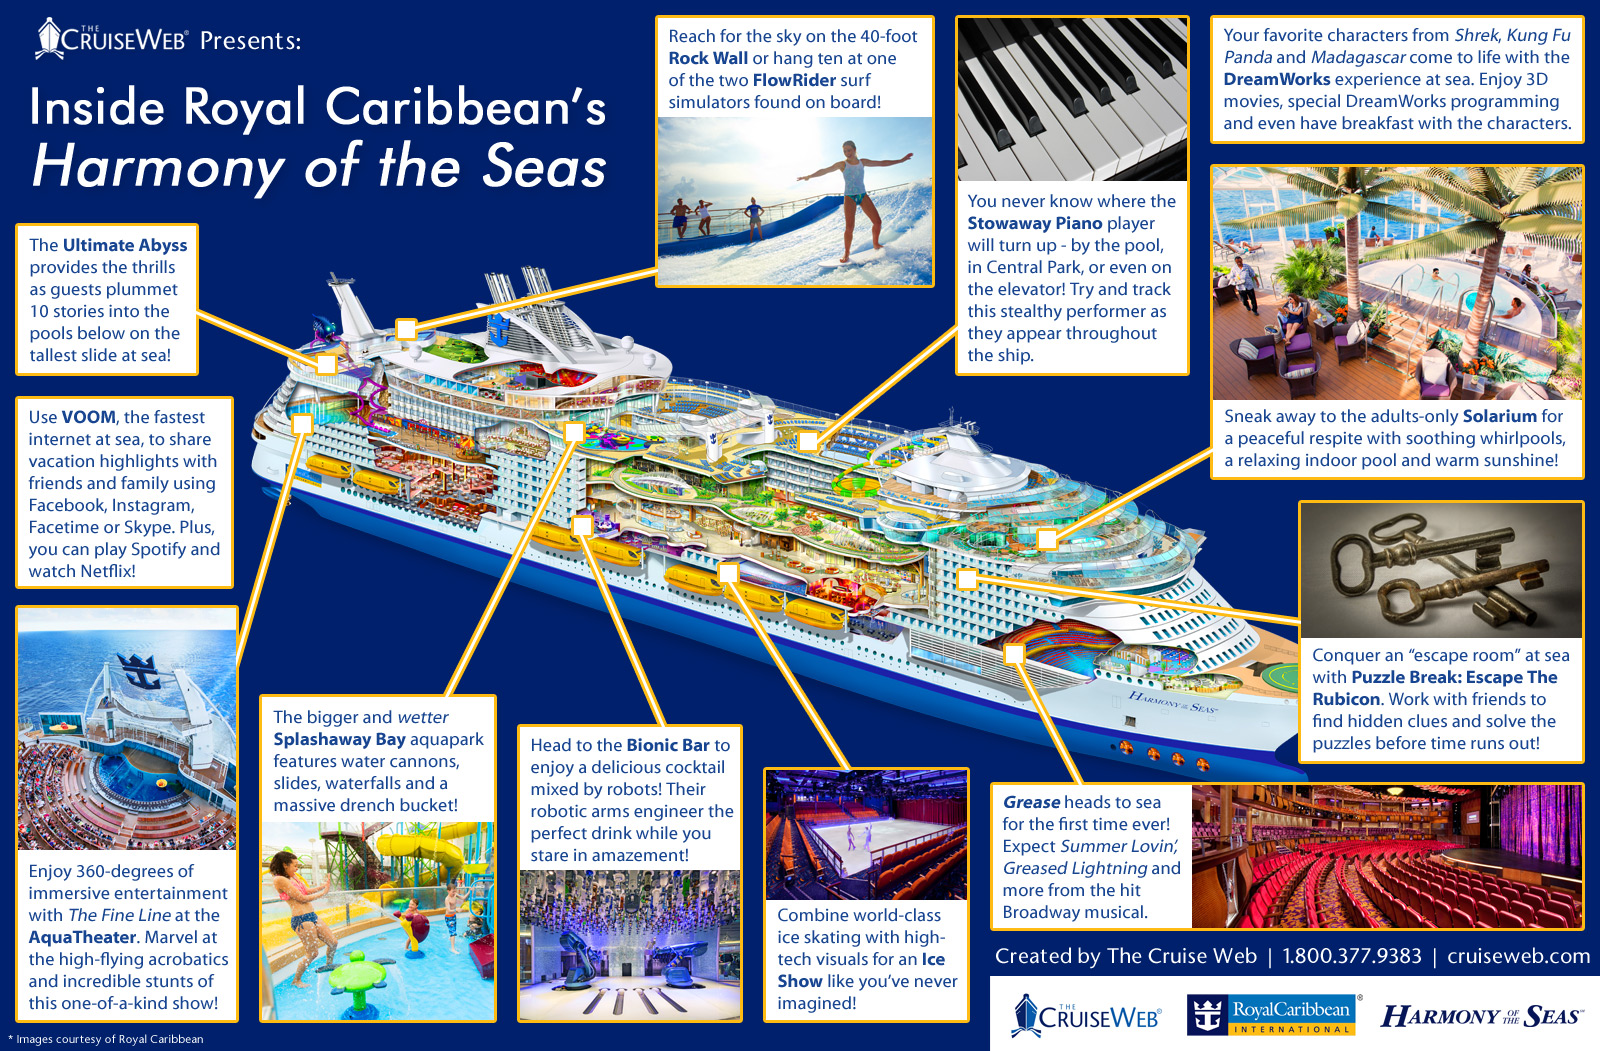 Royal Caribbeans Harmony of the Seas Cruise Ship 2017